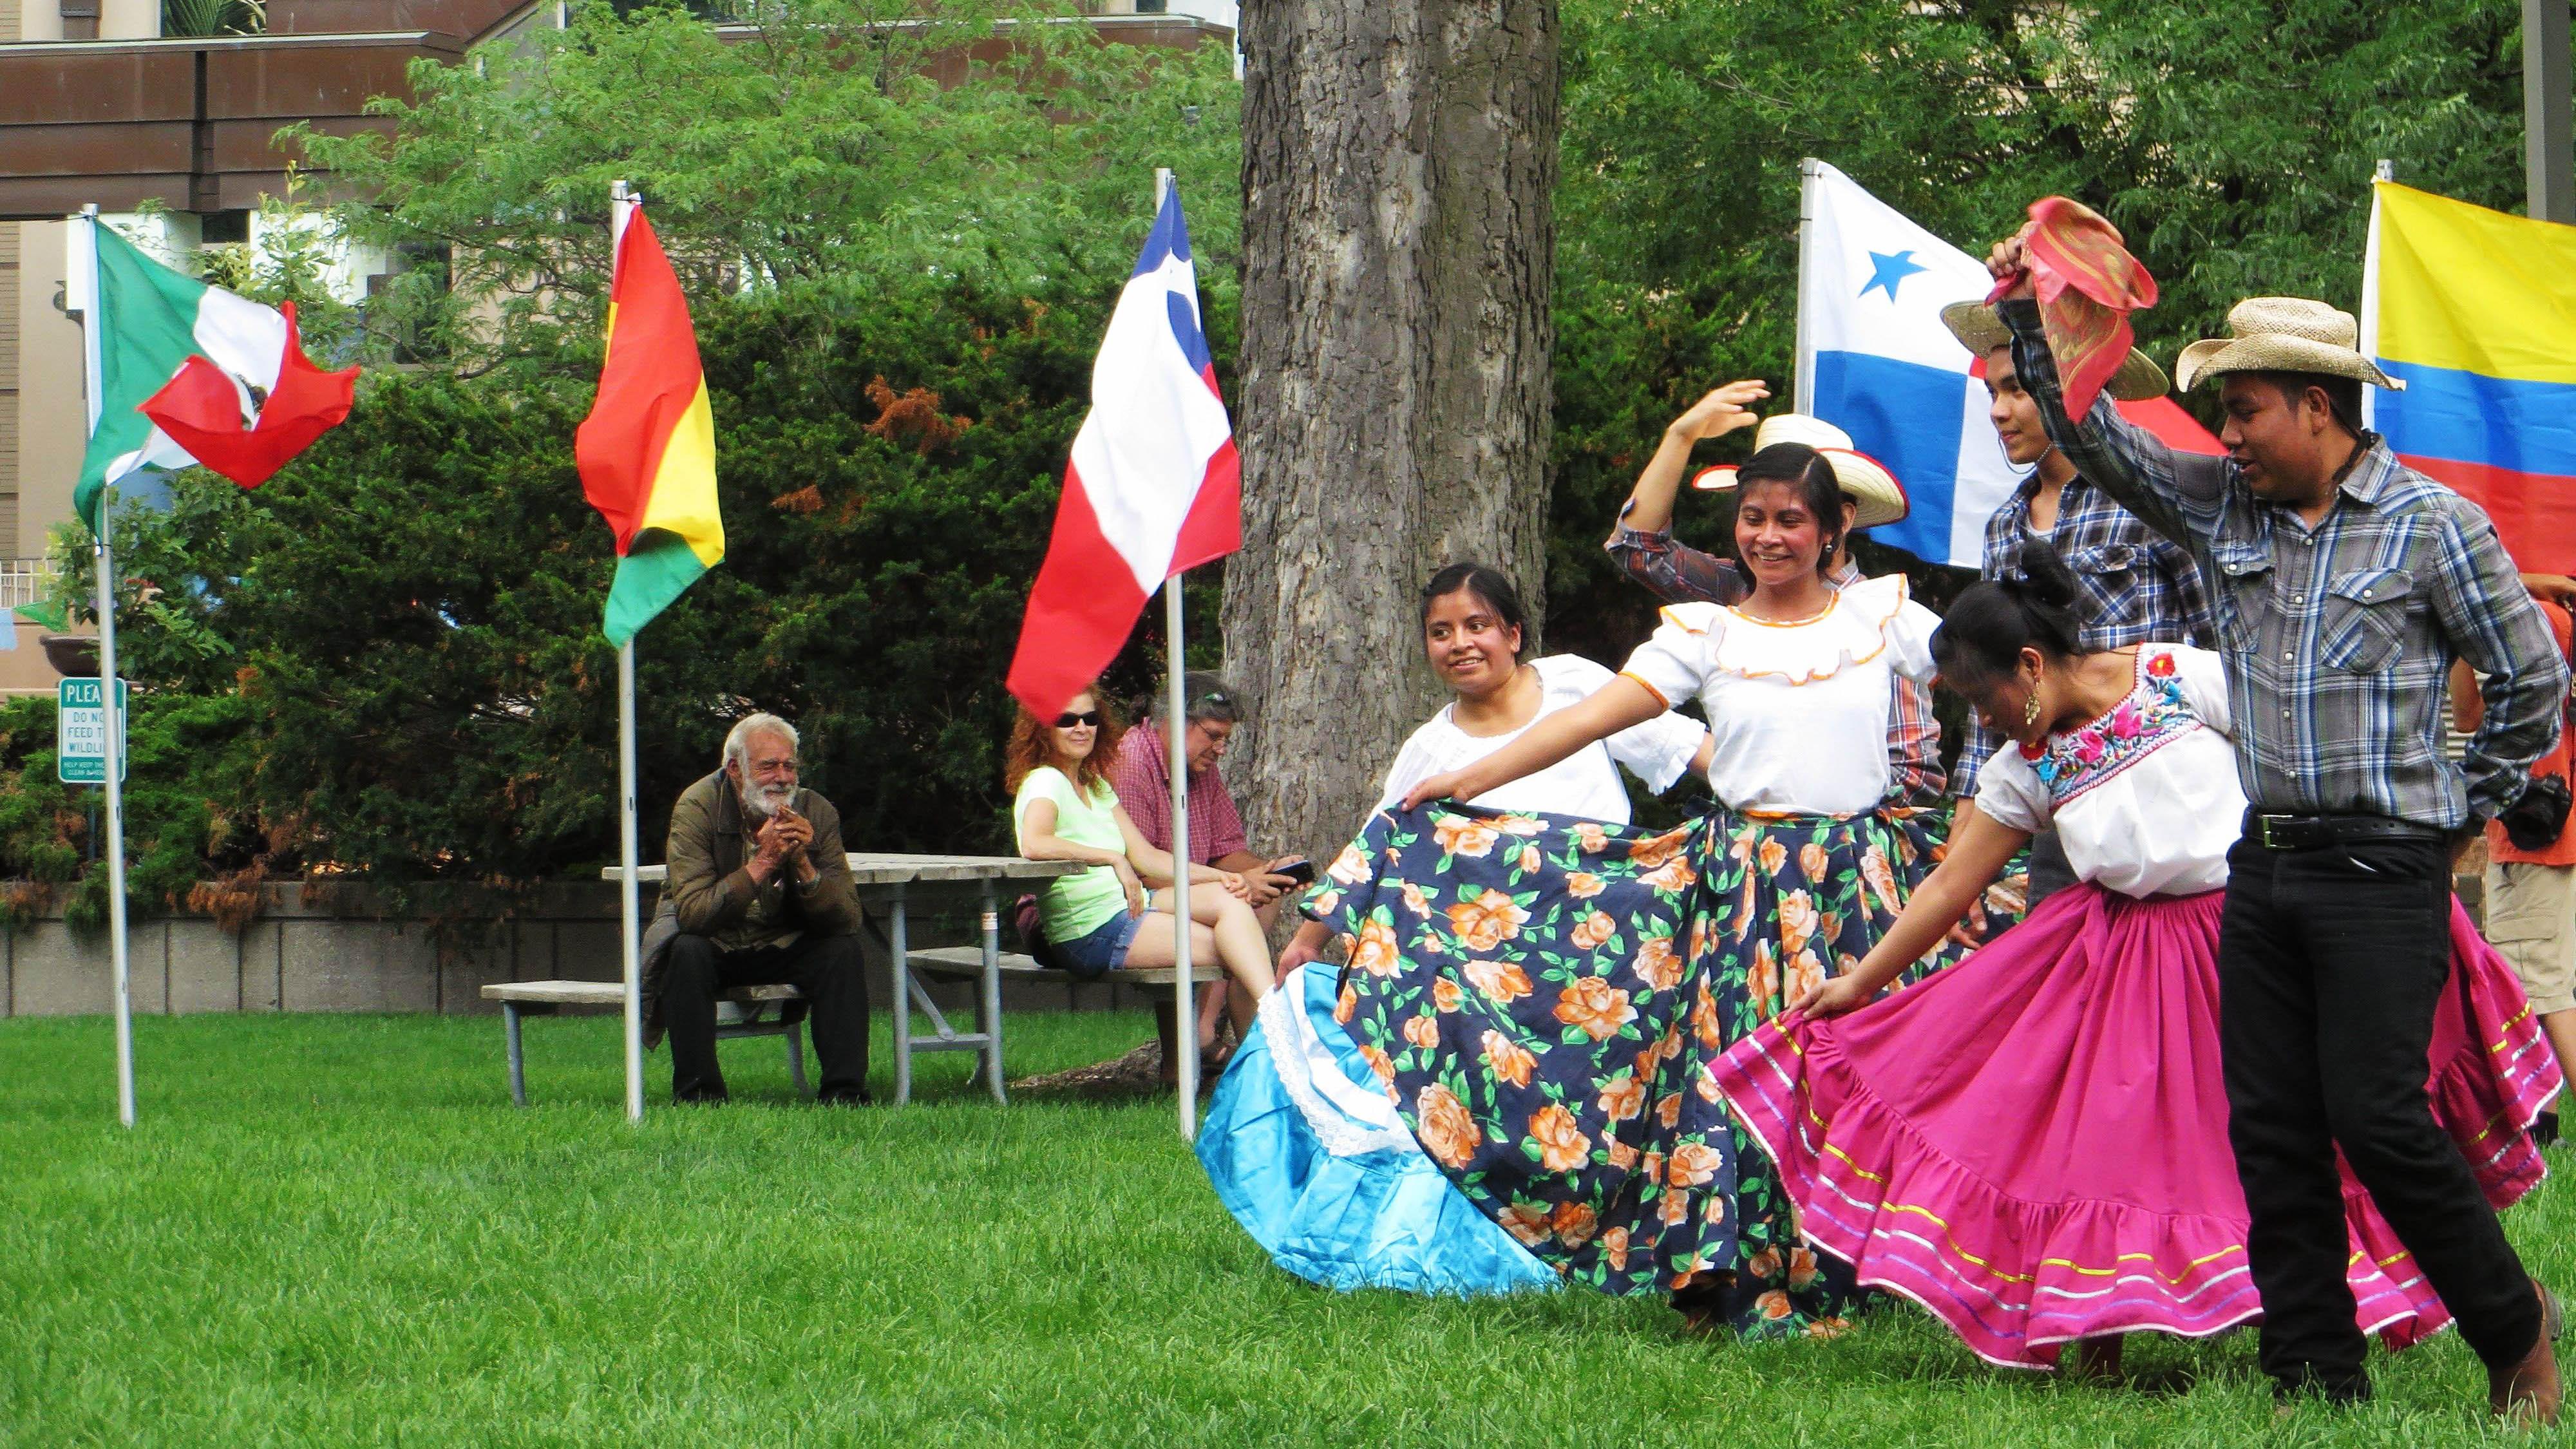 Latino_festival_-_25_NEW.jpg